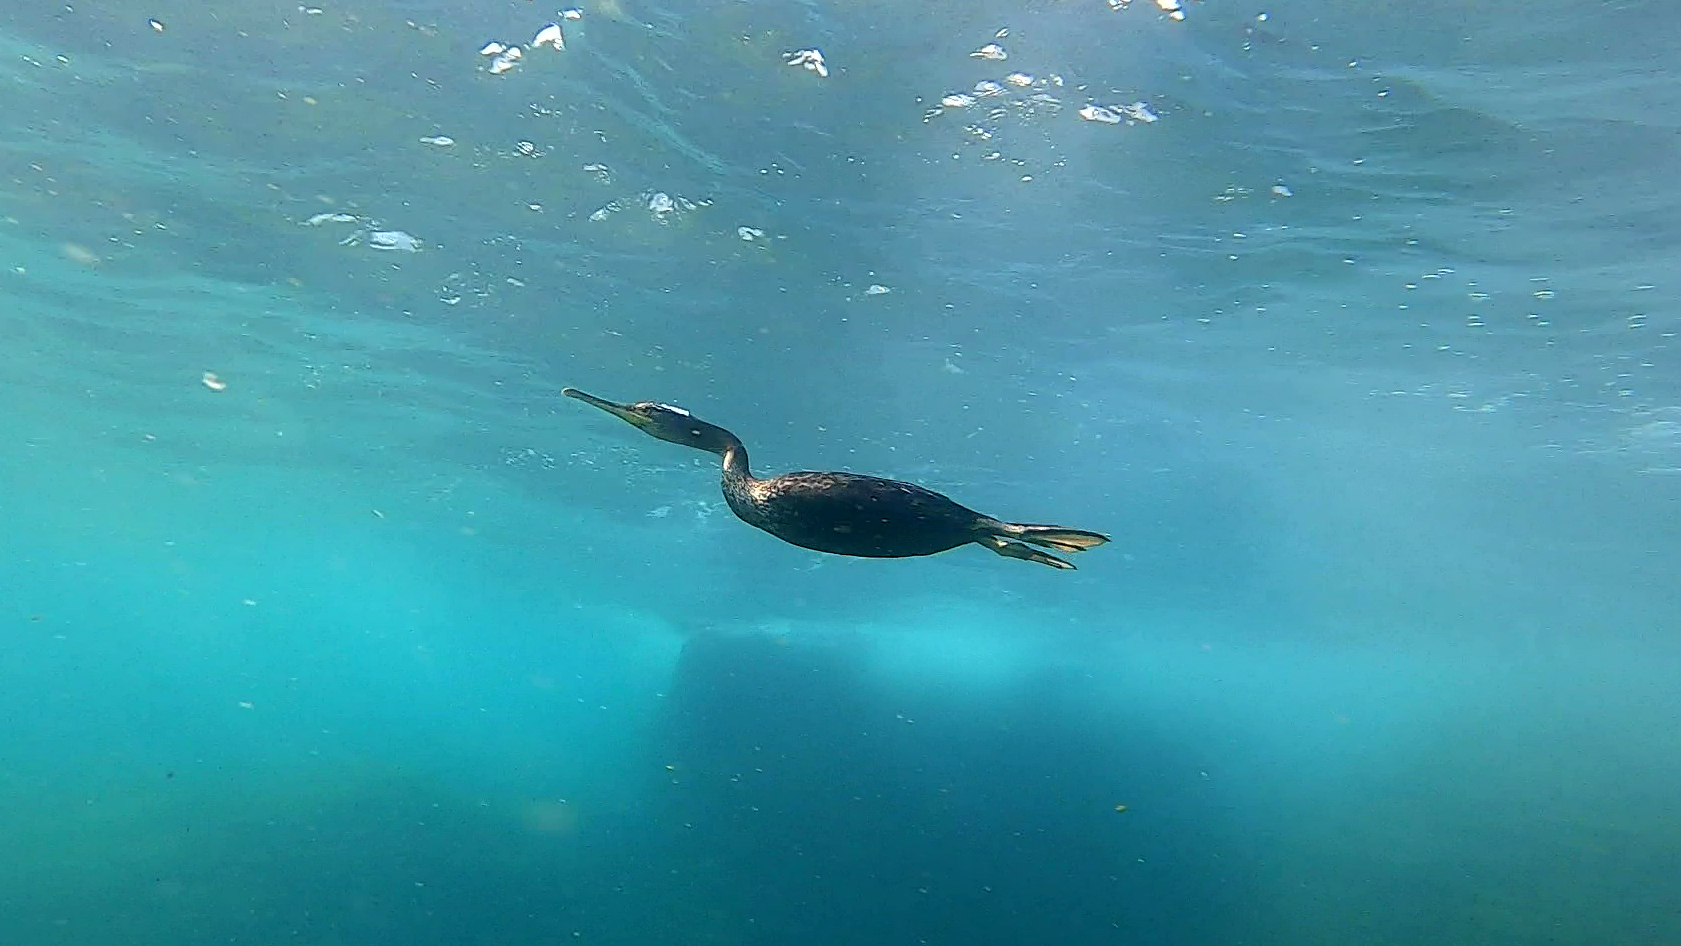 Born freediver - Great cormorant - Phalacrocorax carbo